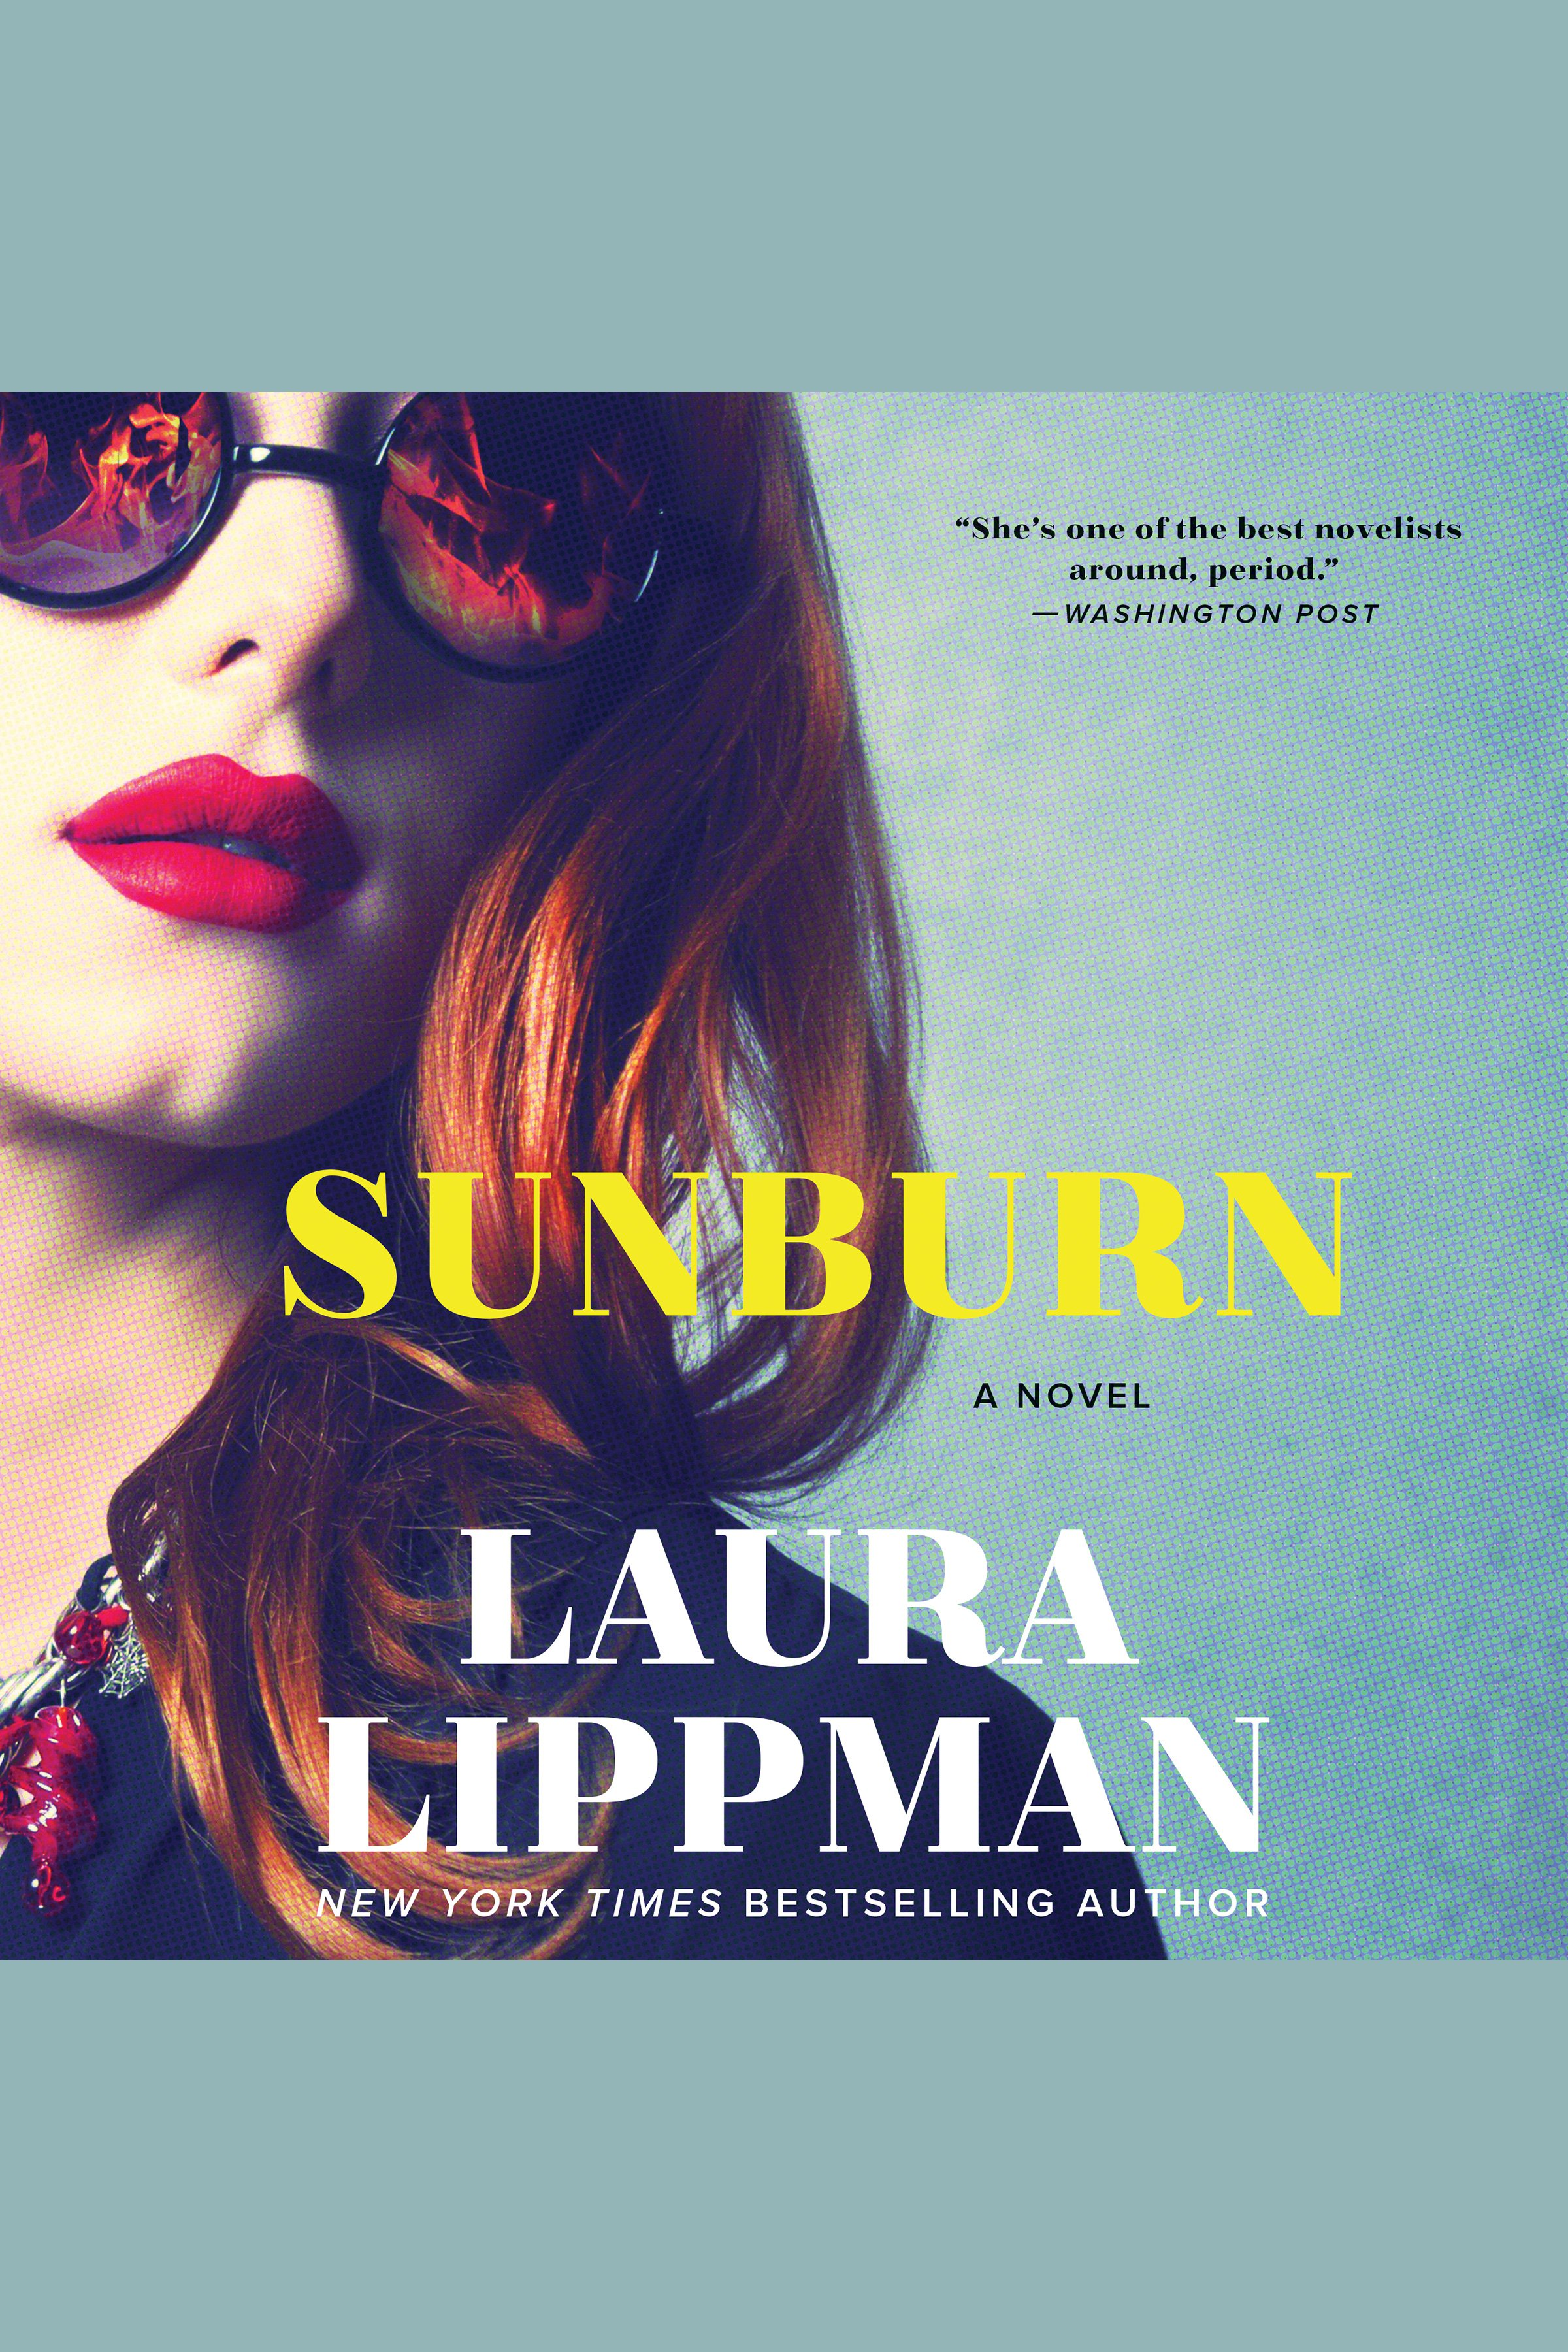 Sunburn cover image